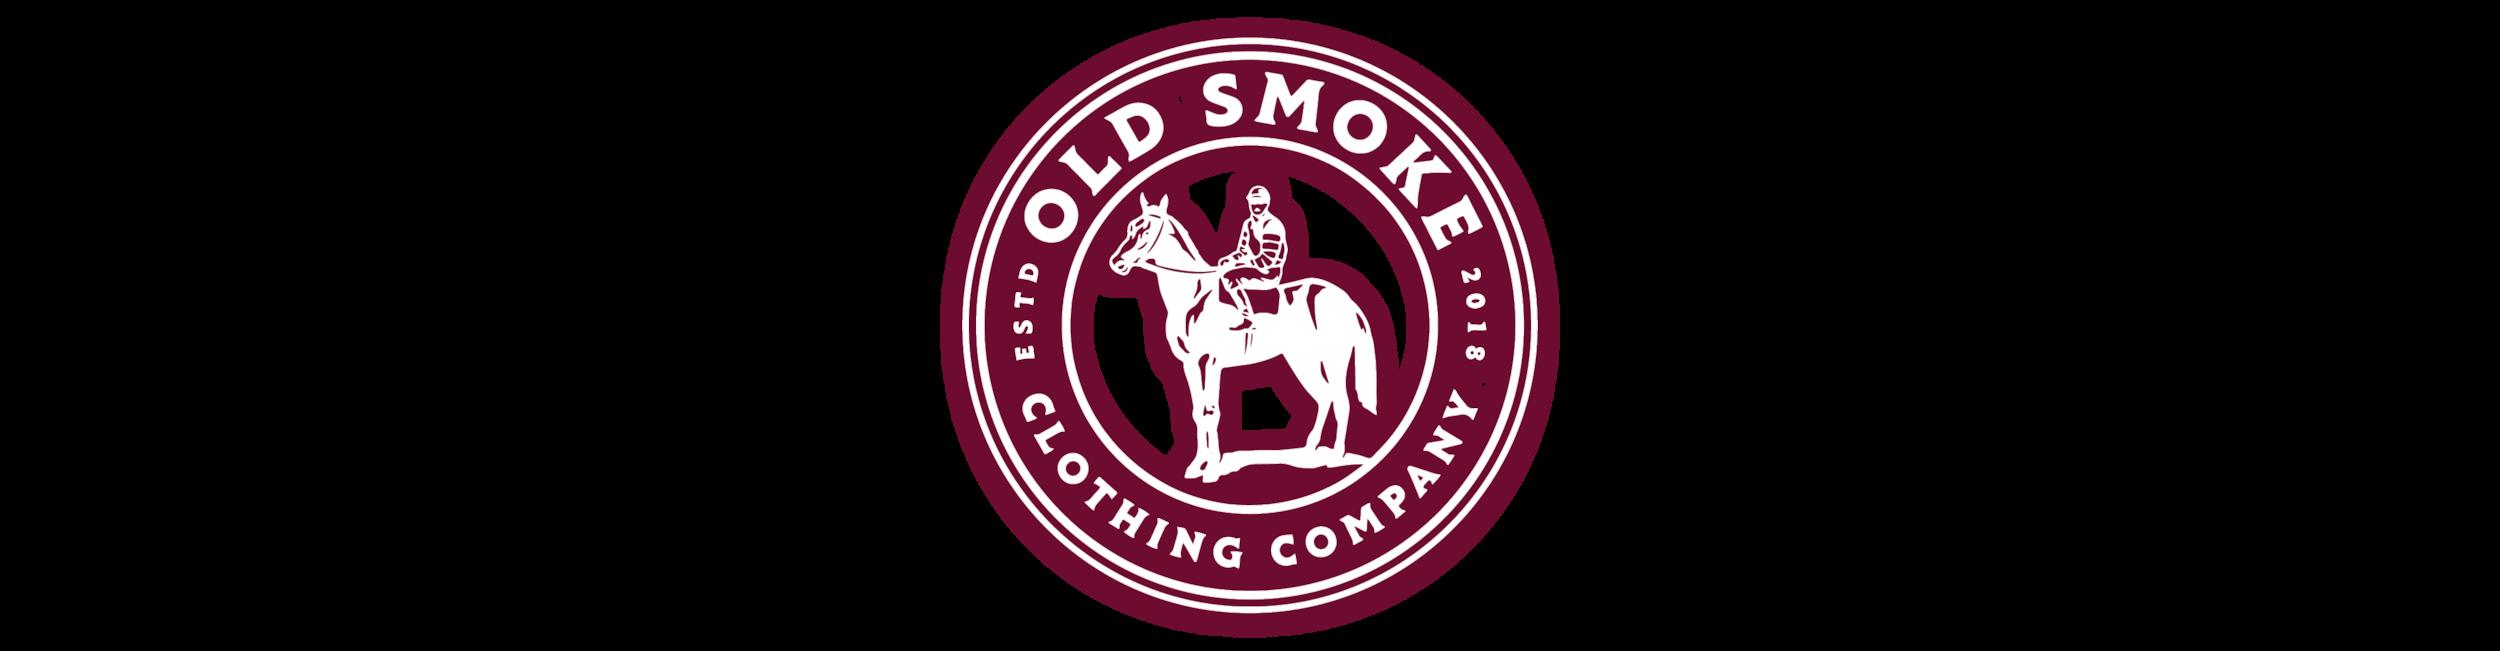 OldSmoke_LogoOverlay.png